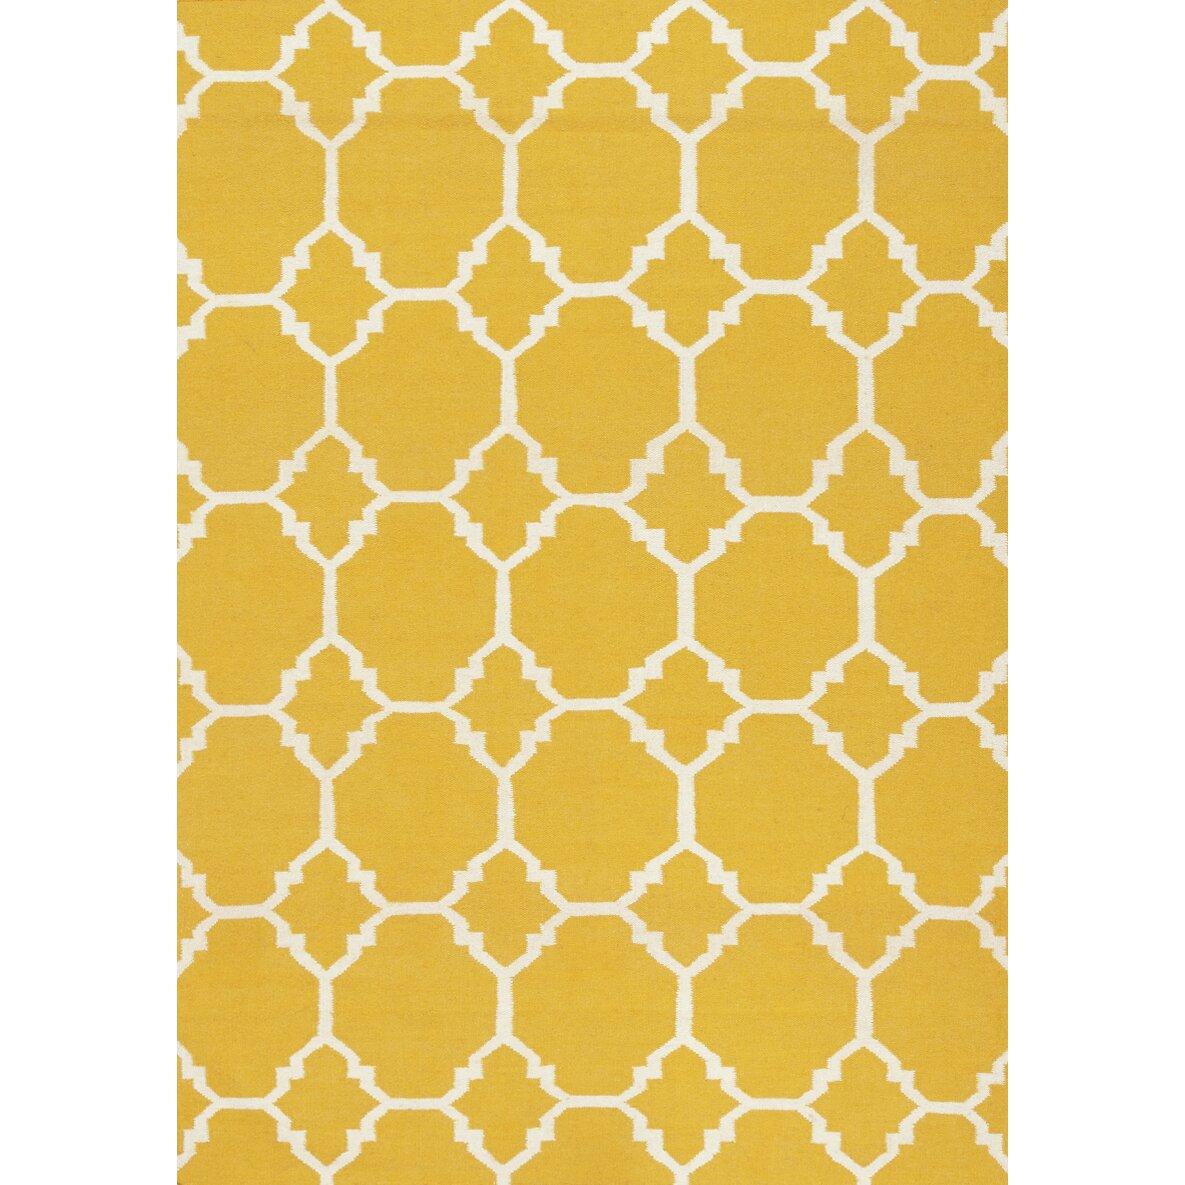 kalora raja yellow moroccan yellow white area rug. Black Bedroom Furniture Sets. Home Design Ideas